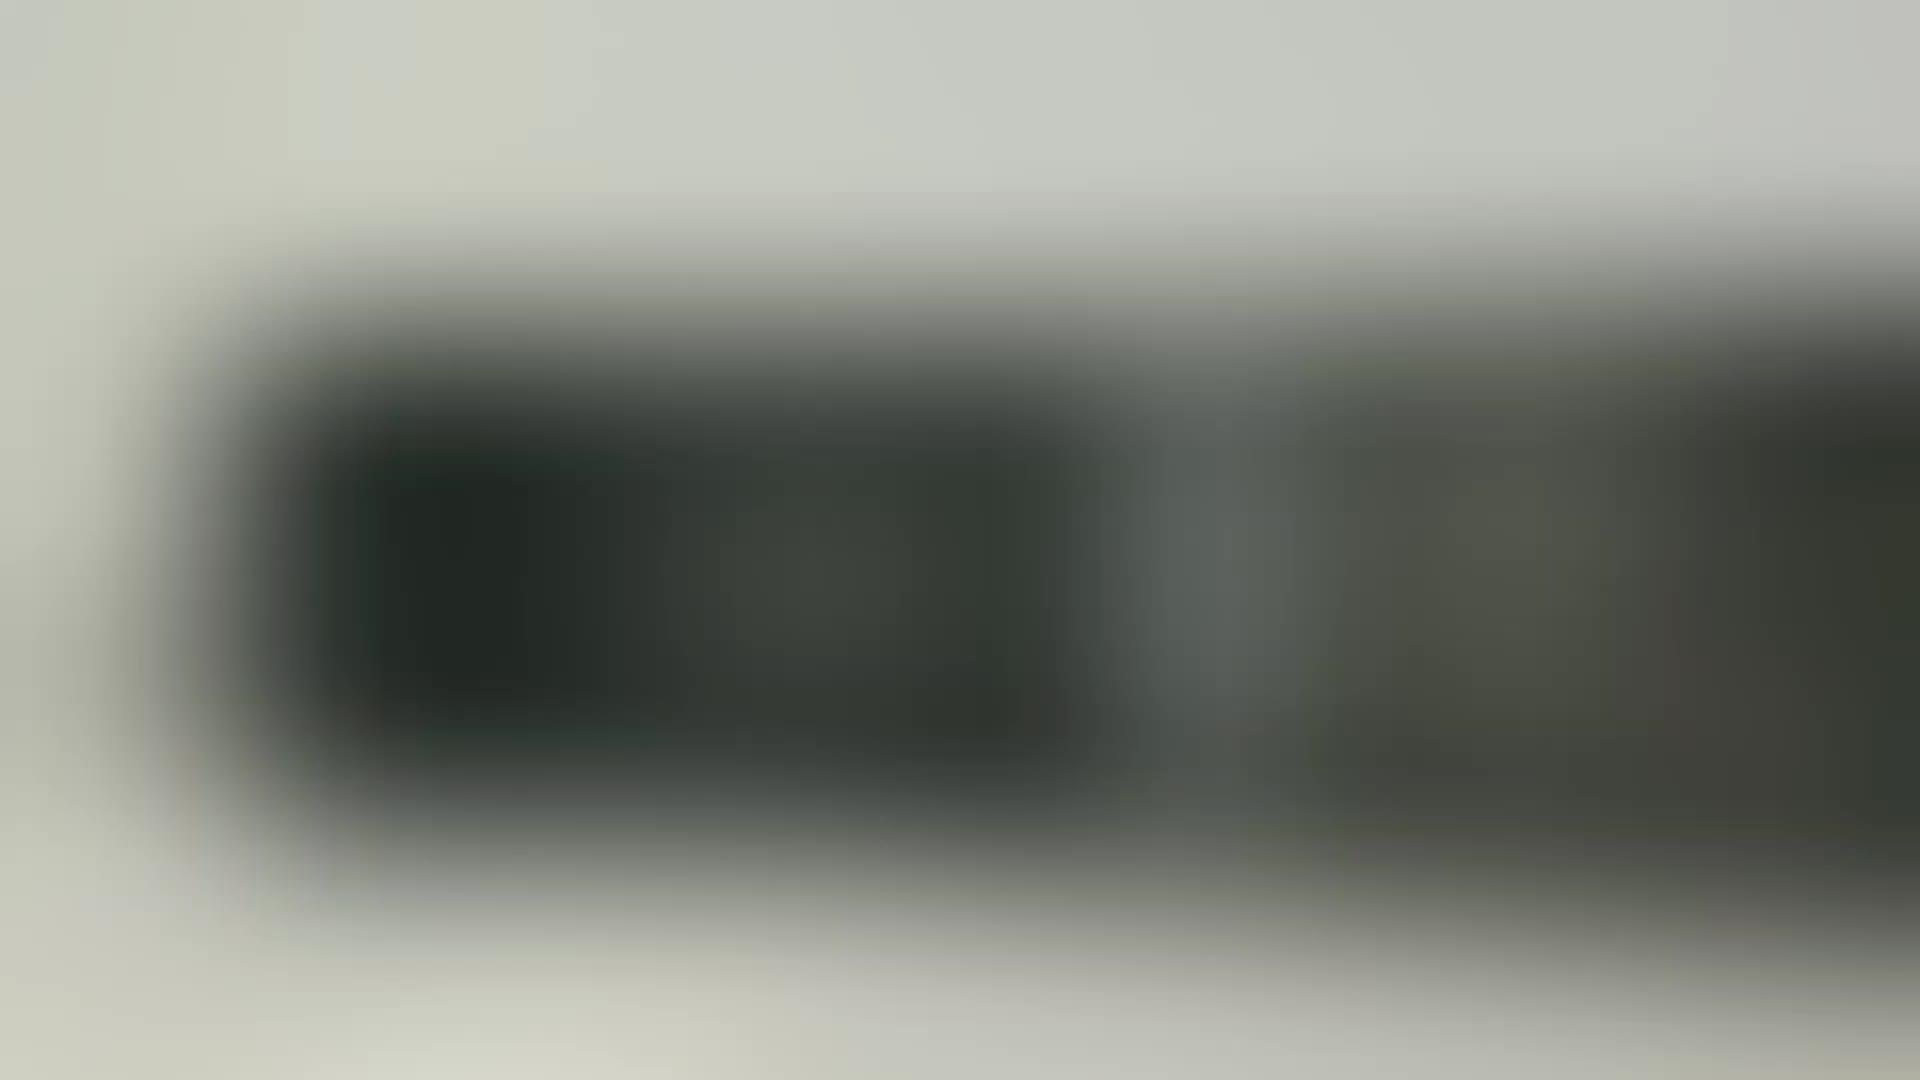 Sinbosen 20000Q Kelas TD Sirkuit 4 Channel Subwoofer Profesional Audio Power Amplifier